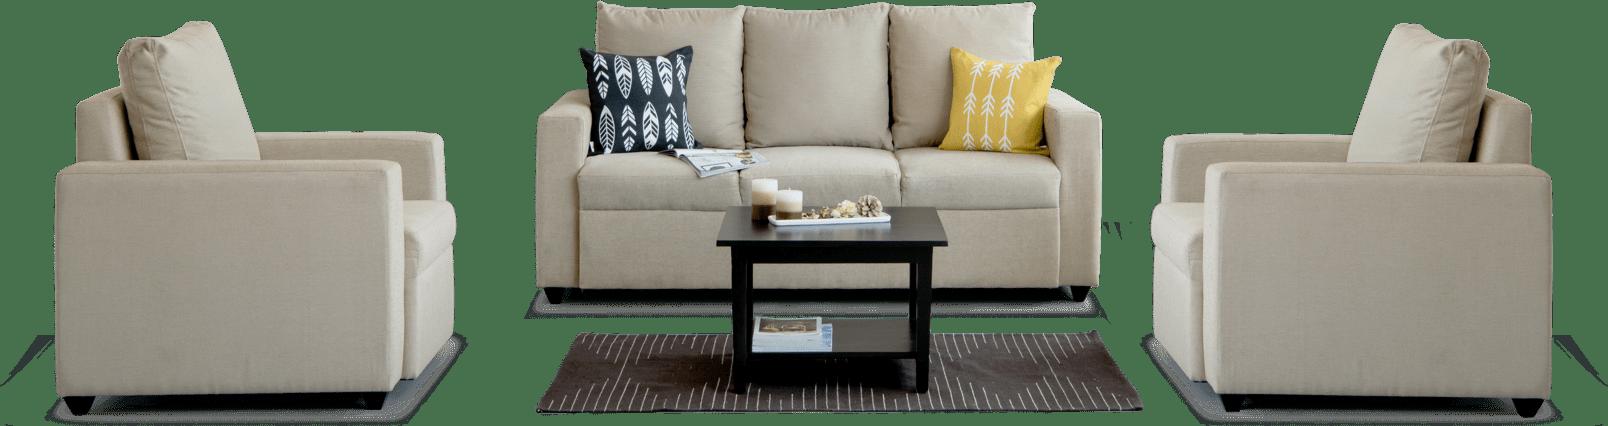 Living Room Furniture Png , Transparent Cartoon - Jing.fm